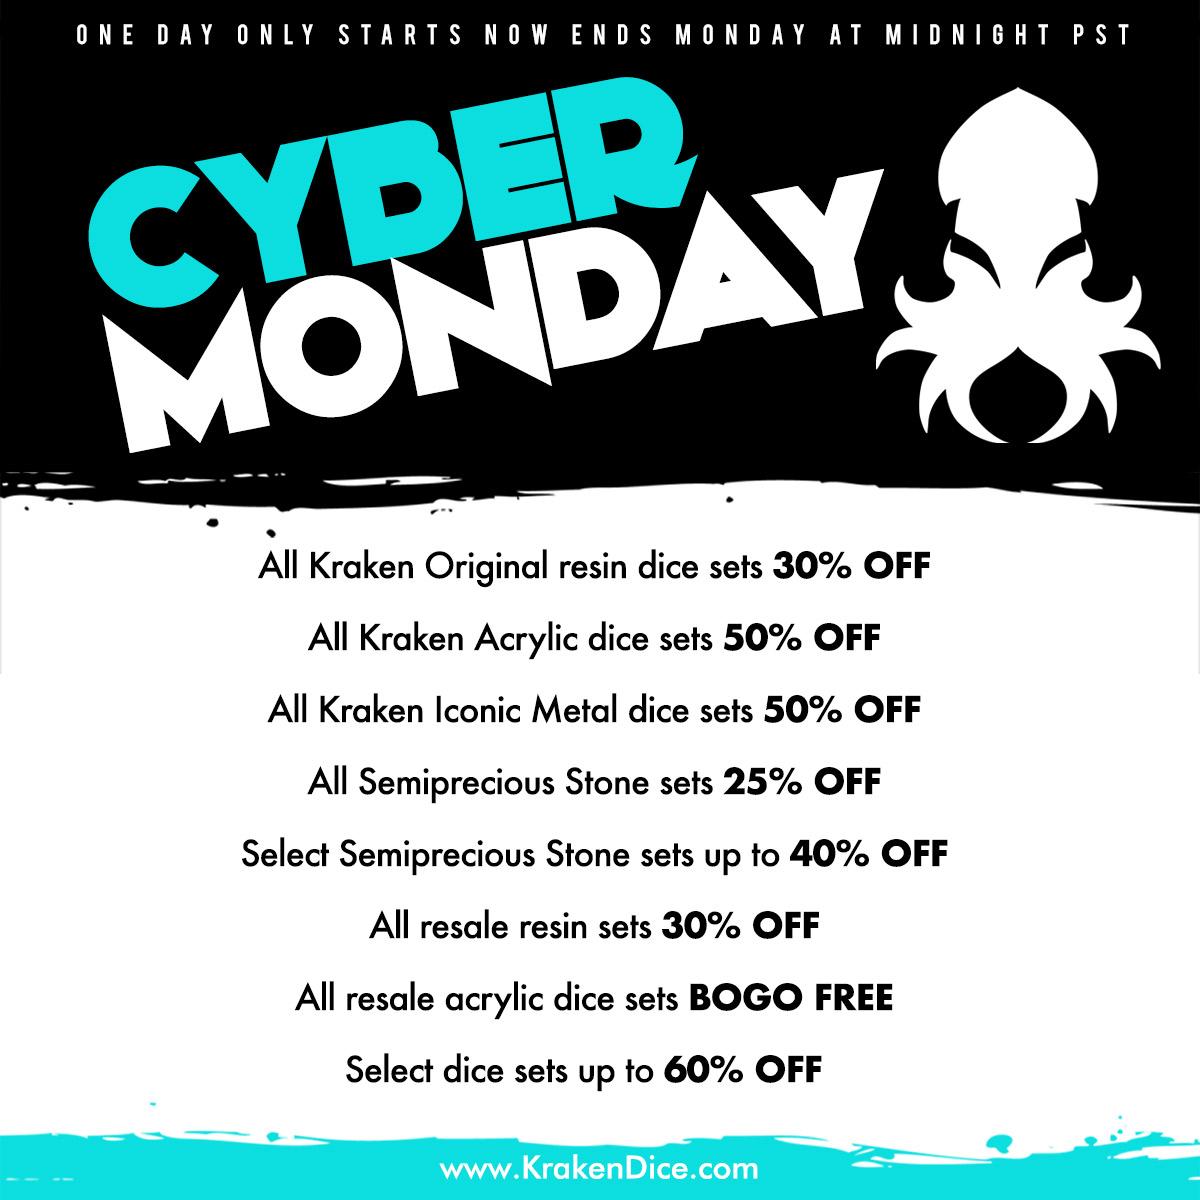 kraken-cyber-monday-2019-deals.jpg